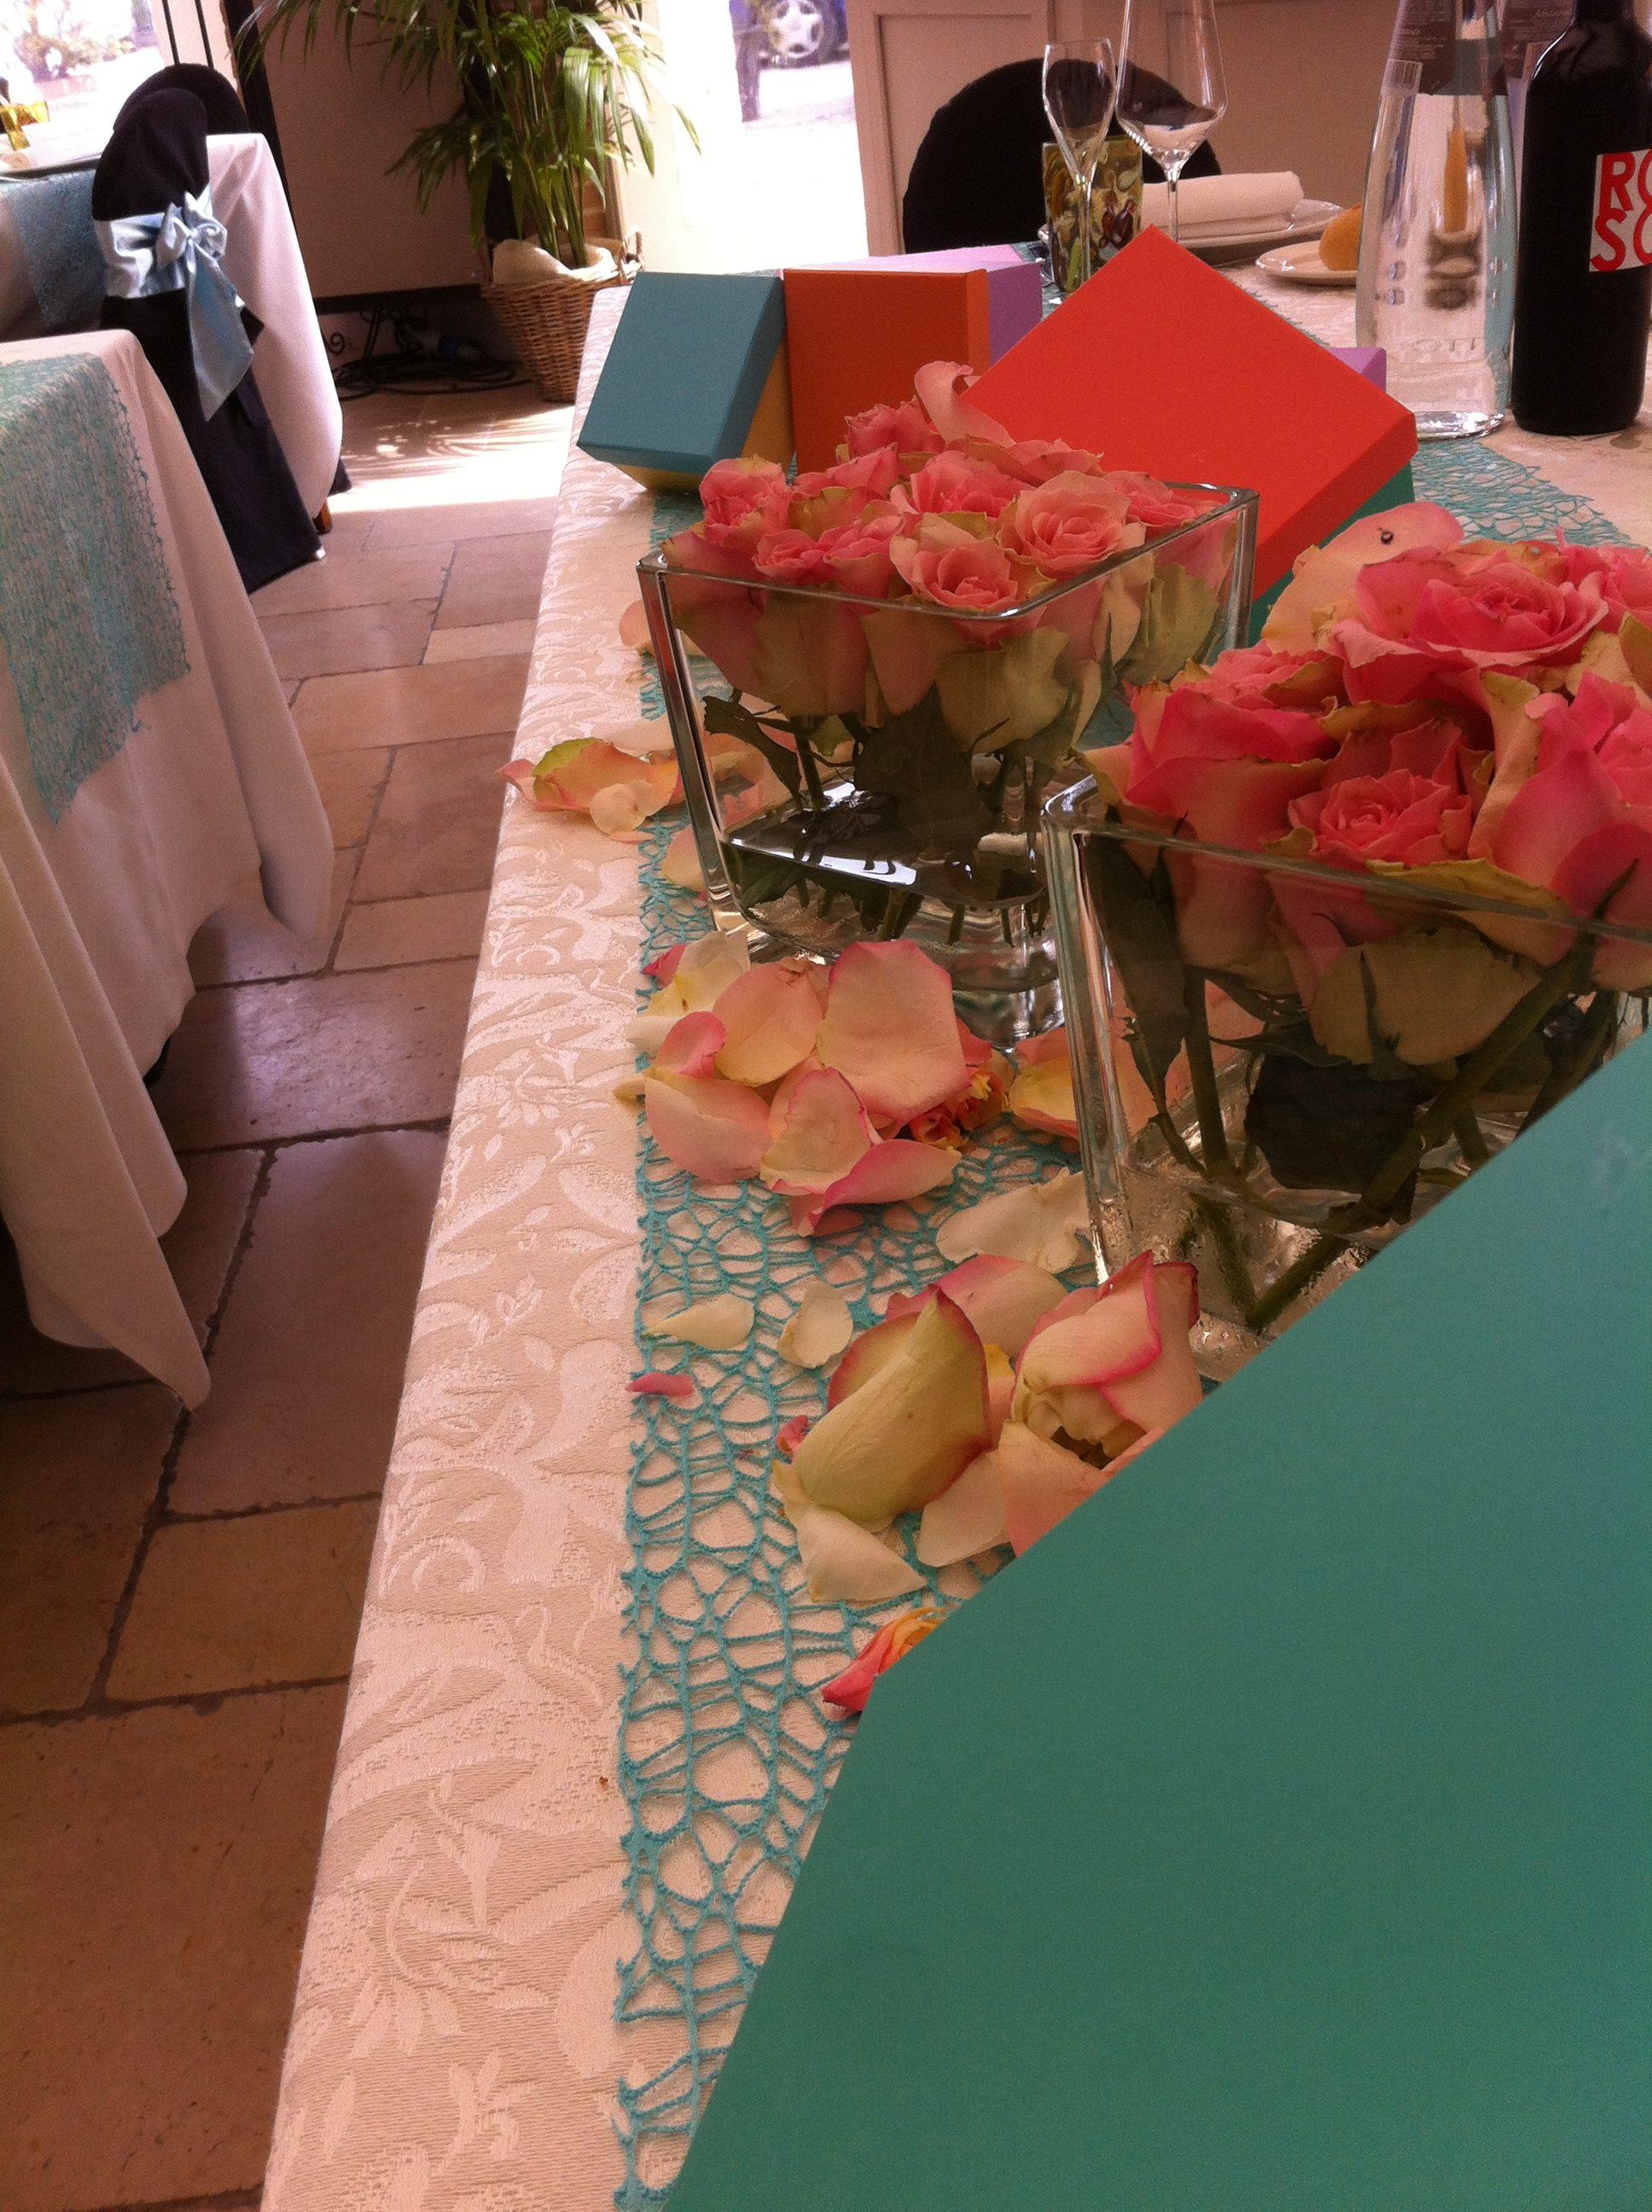 tavola da pranzo di ristorante per cresime